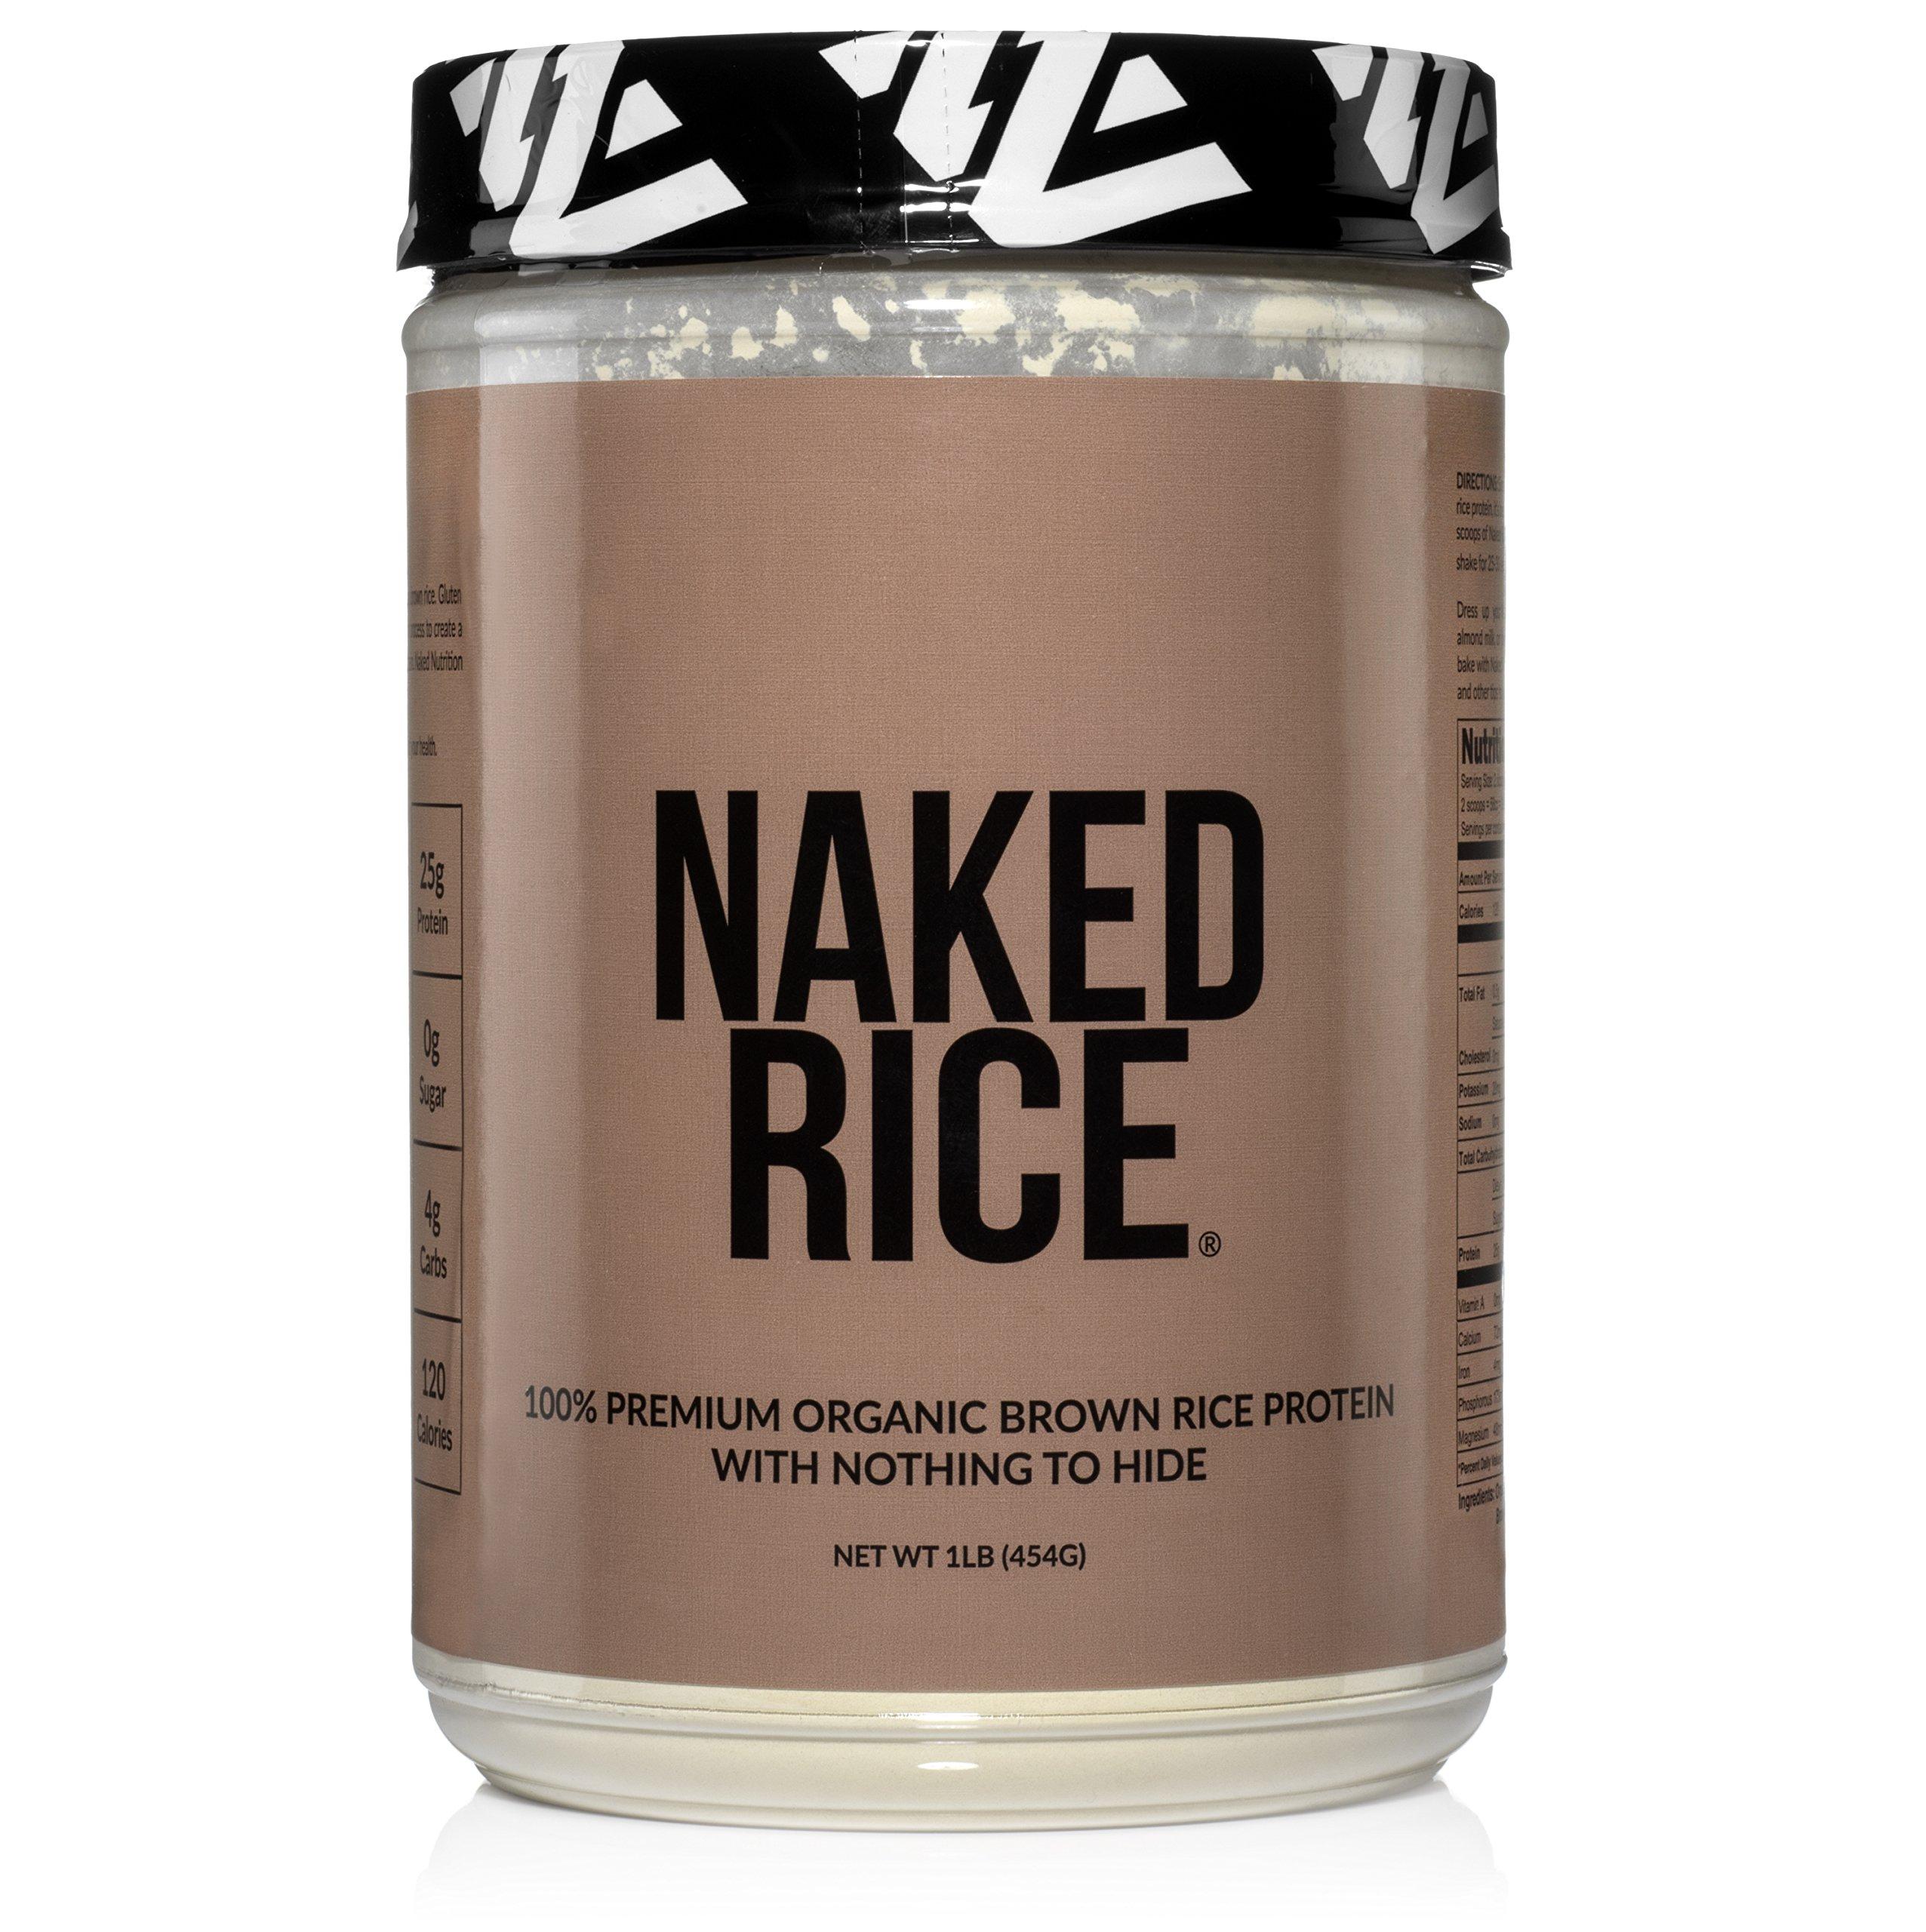 Naked Rice 1LB - Organic Brown Rice Protein Powder - Vegan Protein Powder - 5lb Bulk, GMO Free, Gluten Free & Soy Free. Plant-Based Protein, No Artificial Ingredients - 15 Servings